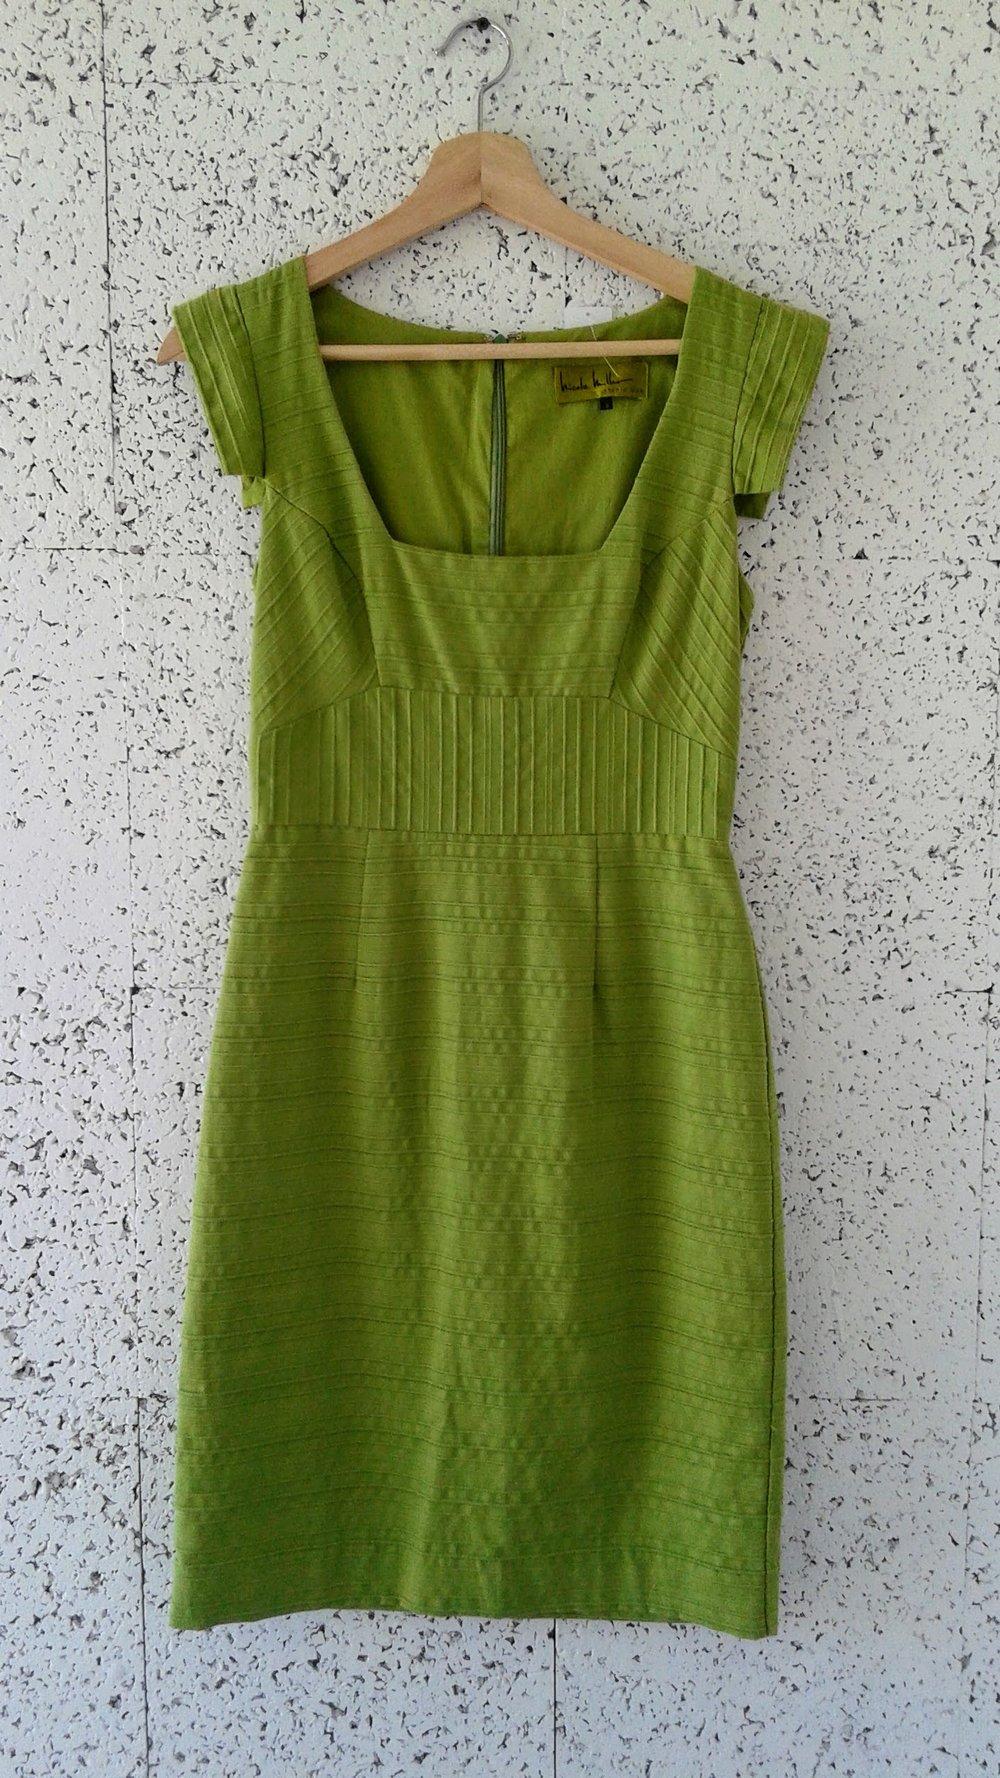 Nicole Miller dress; Size 0, $28